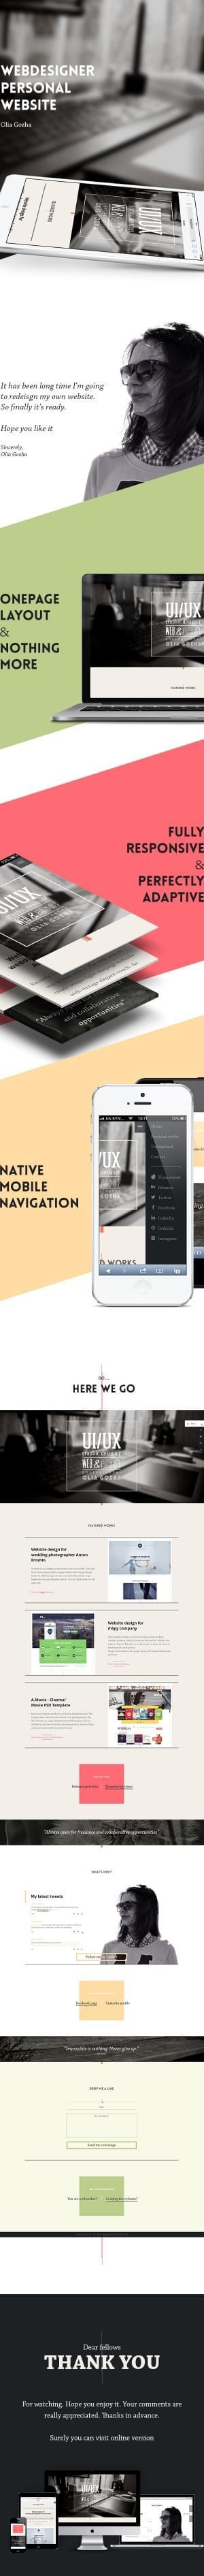 Personal website. Olia Gozha on Behance